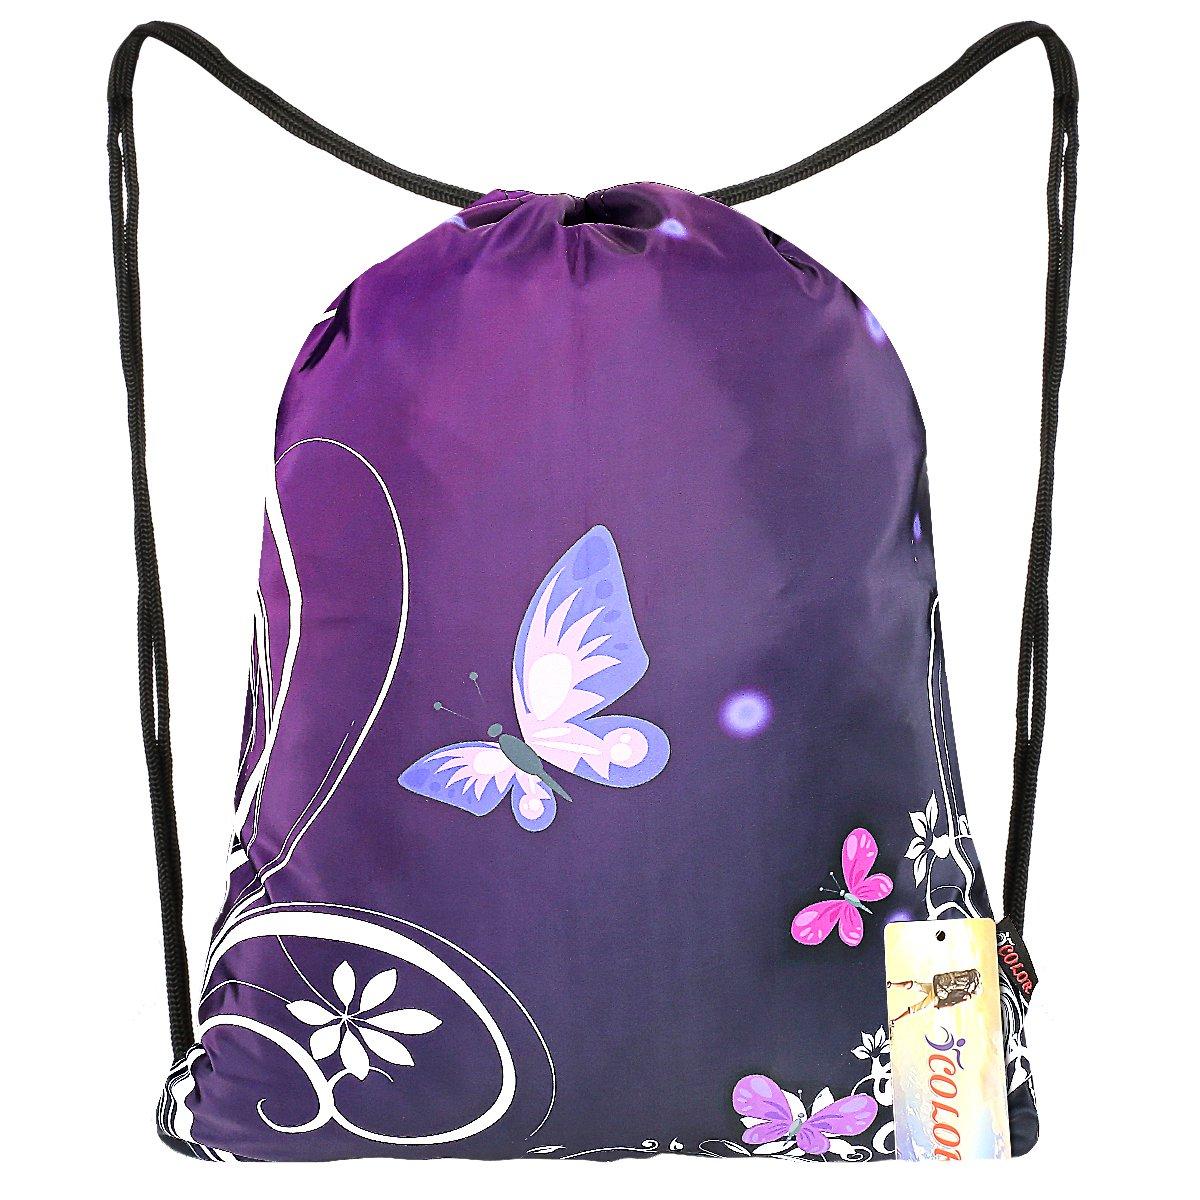 iColor Sackpack,Drawstring Backpacks,Stylish Multipurpose Girls Nylon Drawstring Bags Gym Bags ,Teen Dance Bag, Lightweight Gym Bag for Women Cycling Hiking,Team Training Gymsack (Butterfly & Flower)